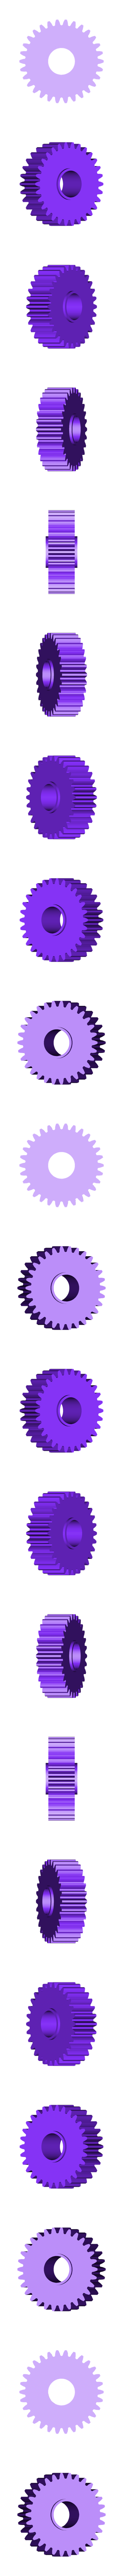 Transfer gear.stl Download free STL file Clockwork pen carousel • 3D printing template, EvolvingExtrusions